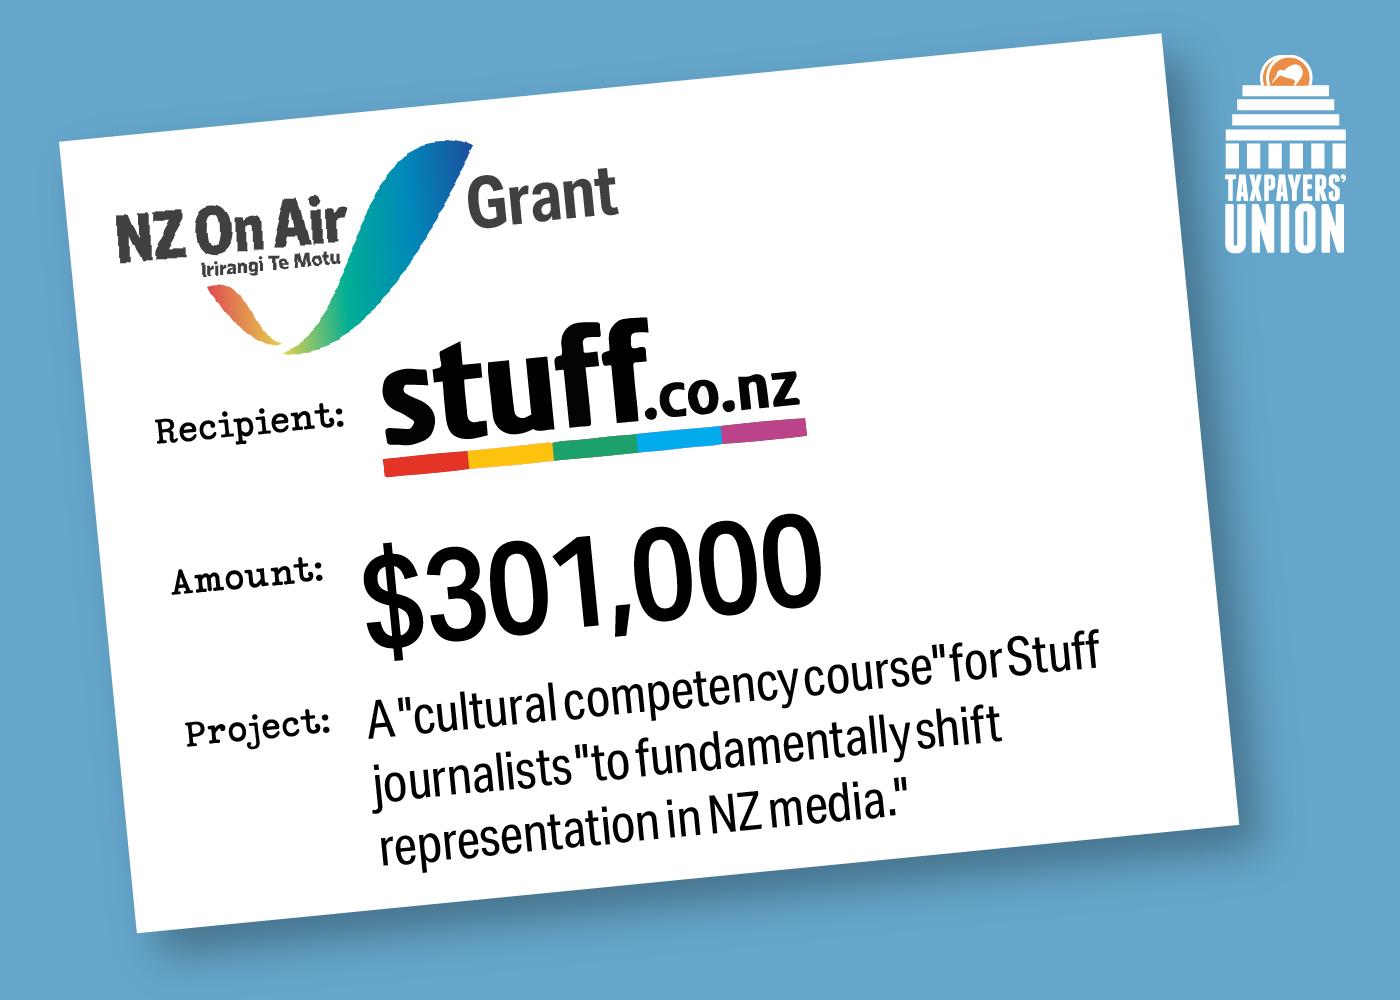 NZ on Air grant